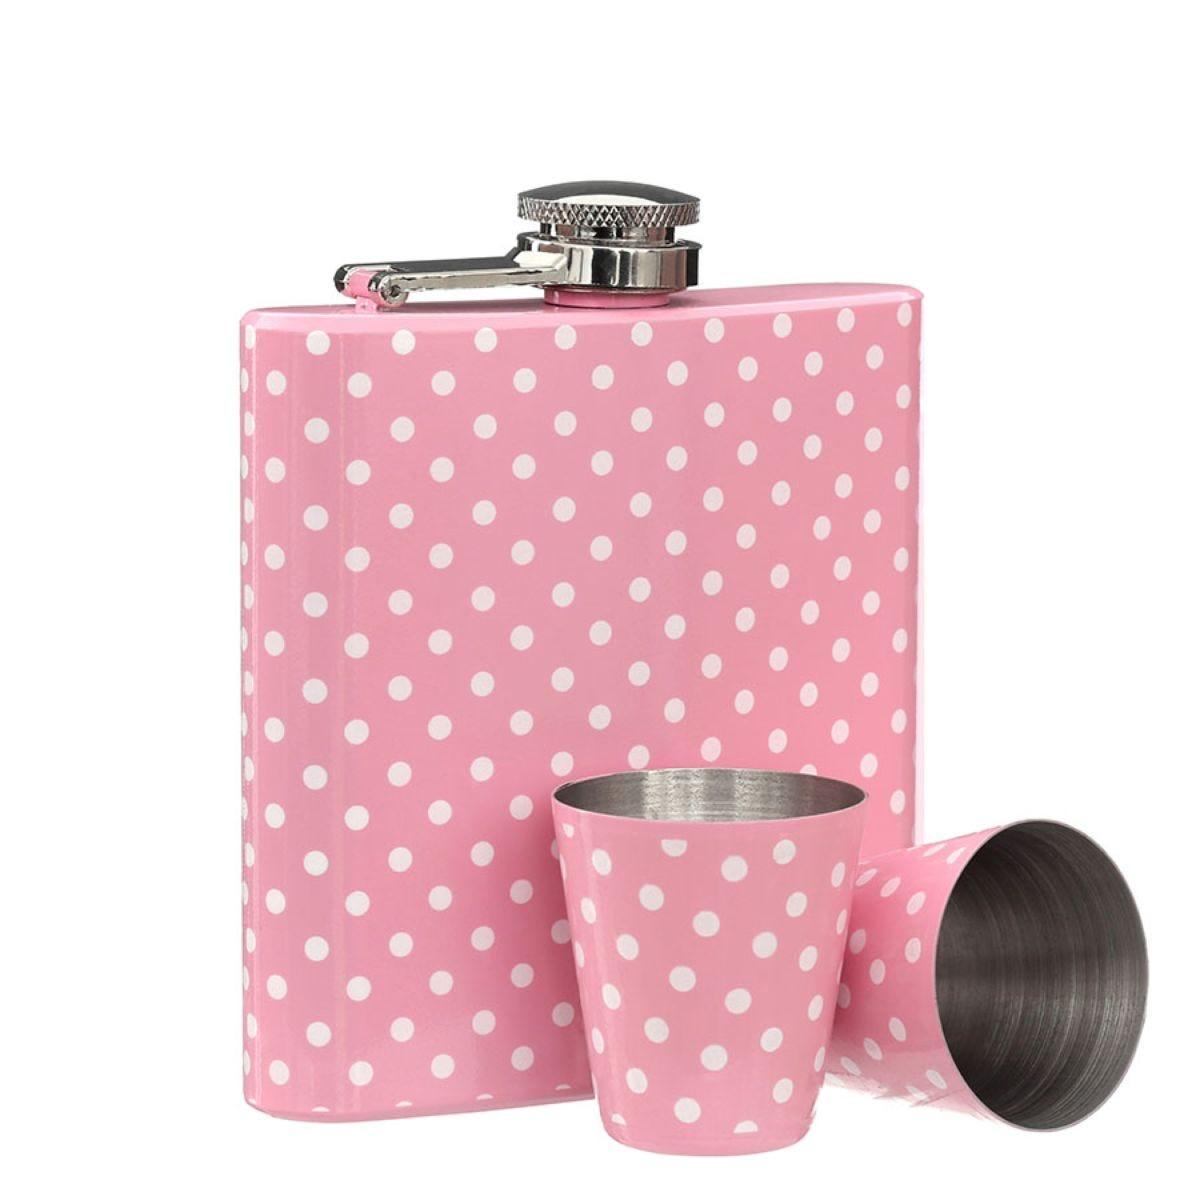 Premier Housewares Stainless Steel Hip Flask Set – Pink Polka Dot